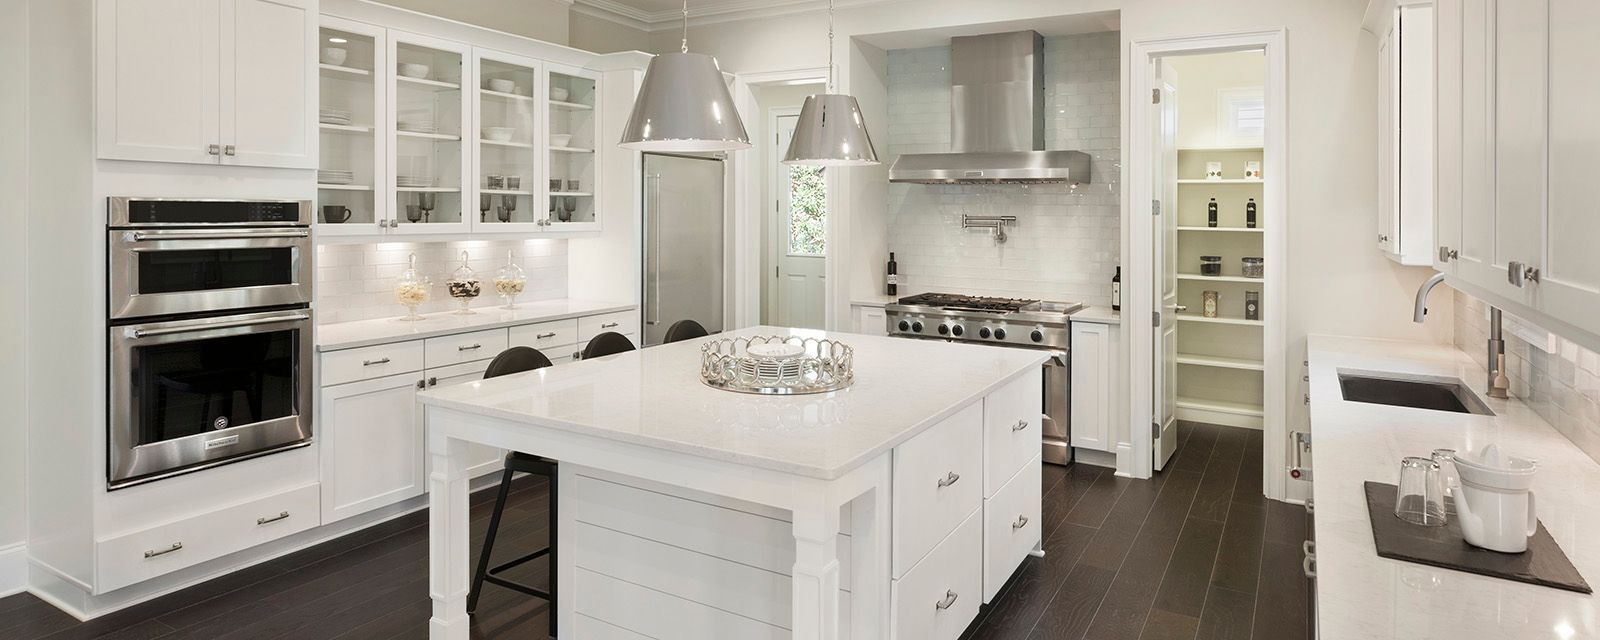 7325 Kemper Drive, Johns Creek, GA Homes & Land - Real Estate